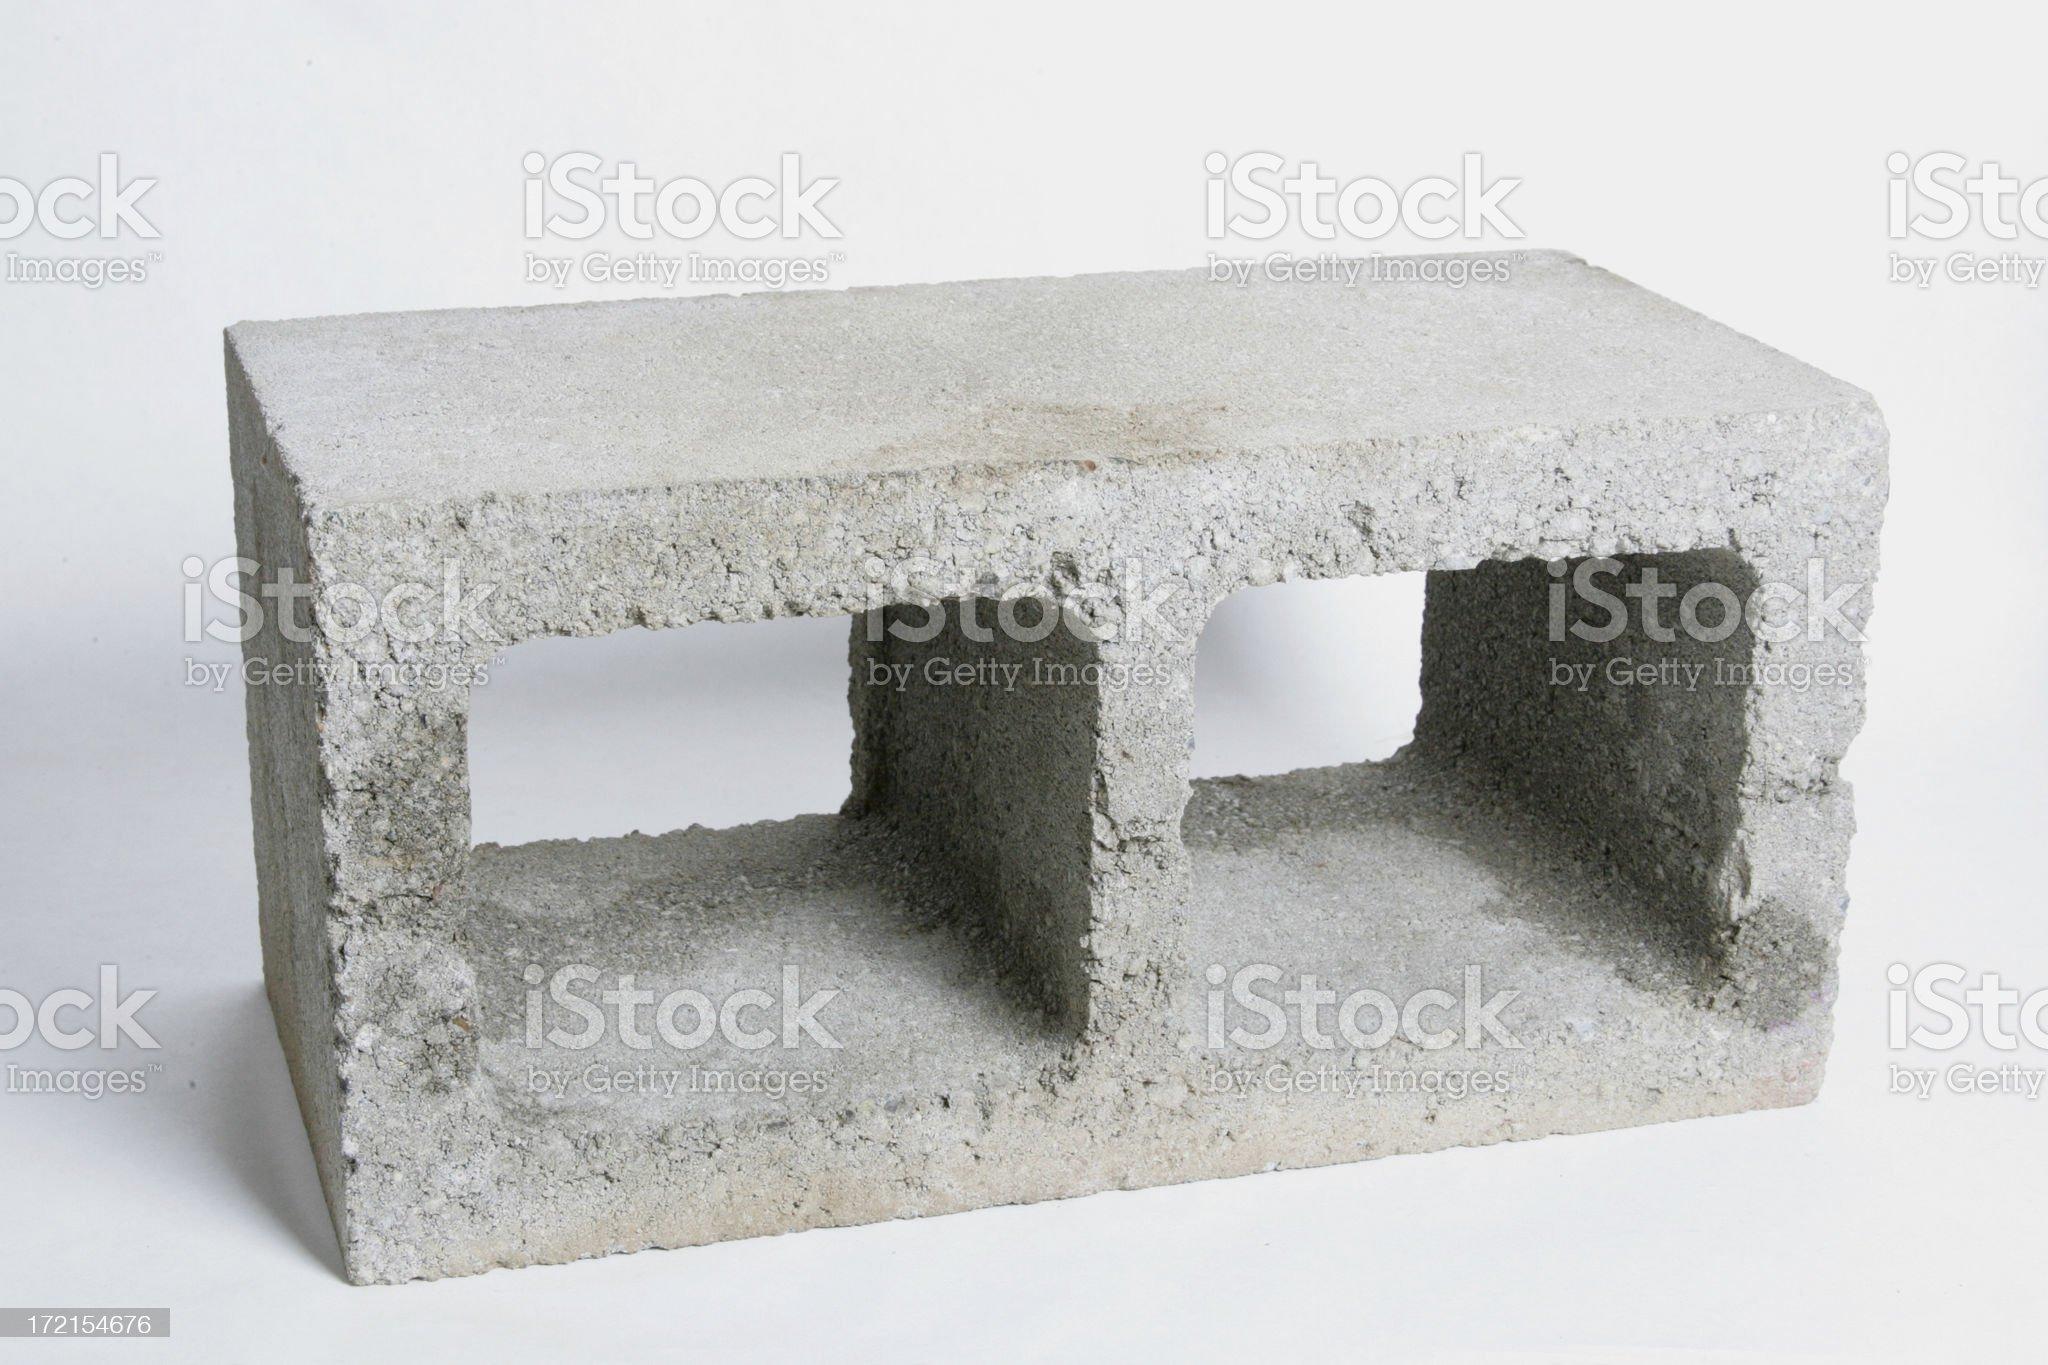 Cement Block royalty-free stock photo